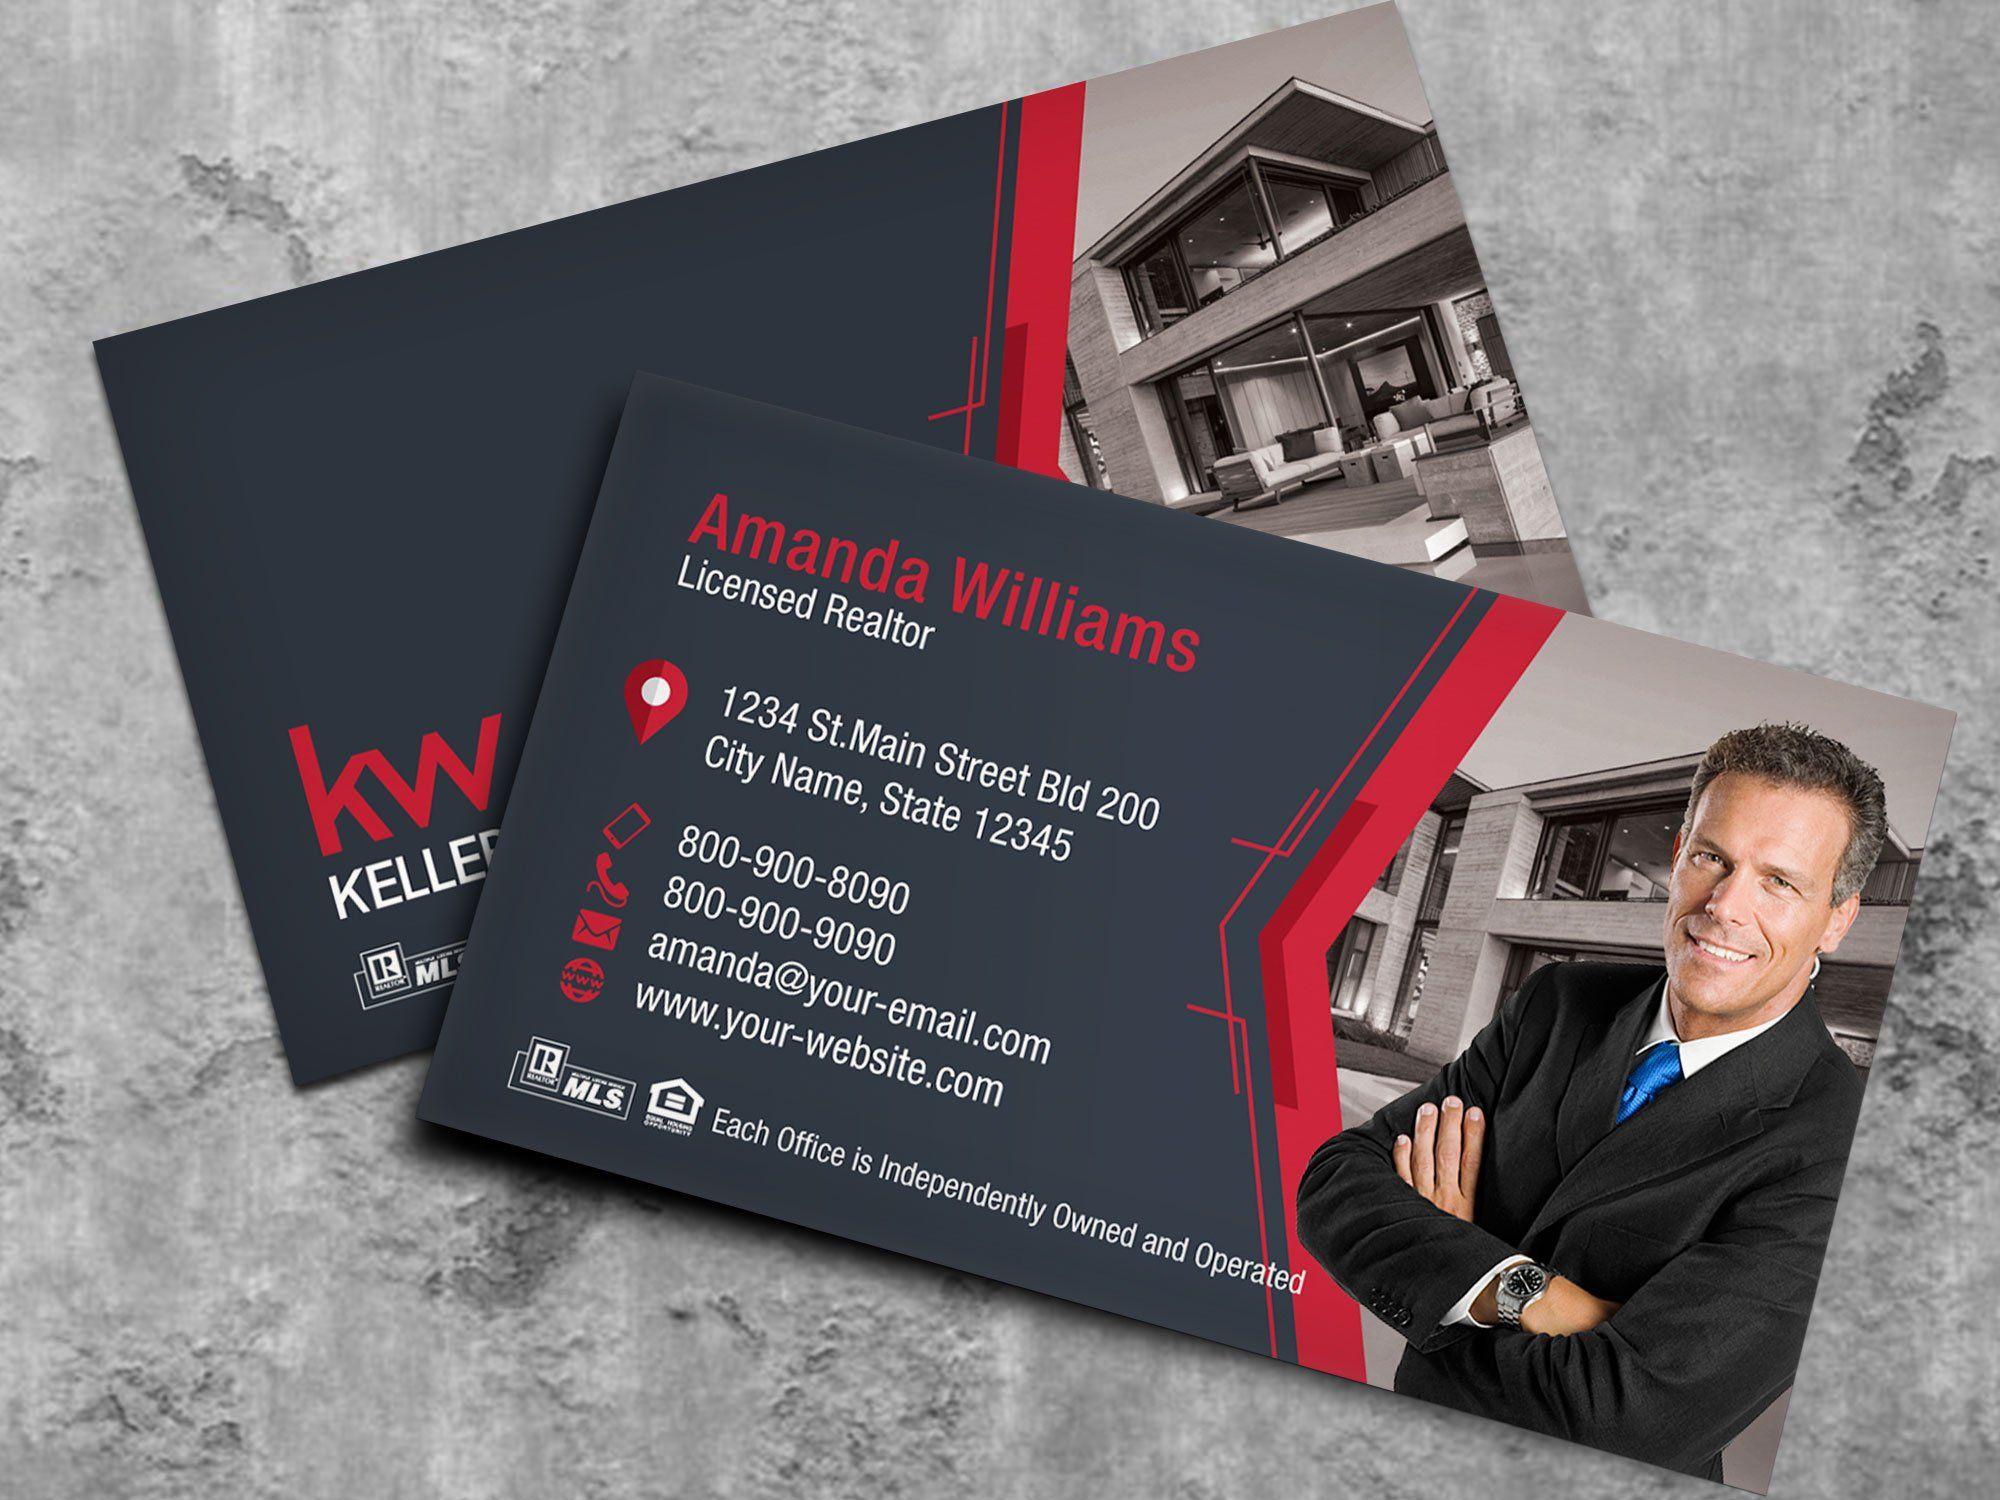 Keller Williams Business Card Real Estate Business Card Etsy In 2021 Keller Williams Business Cards Realtor Business Cards Real Estate Business Cards